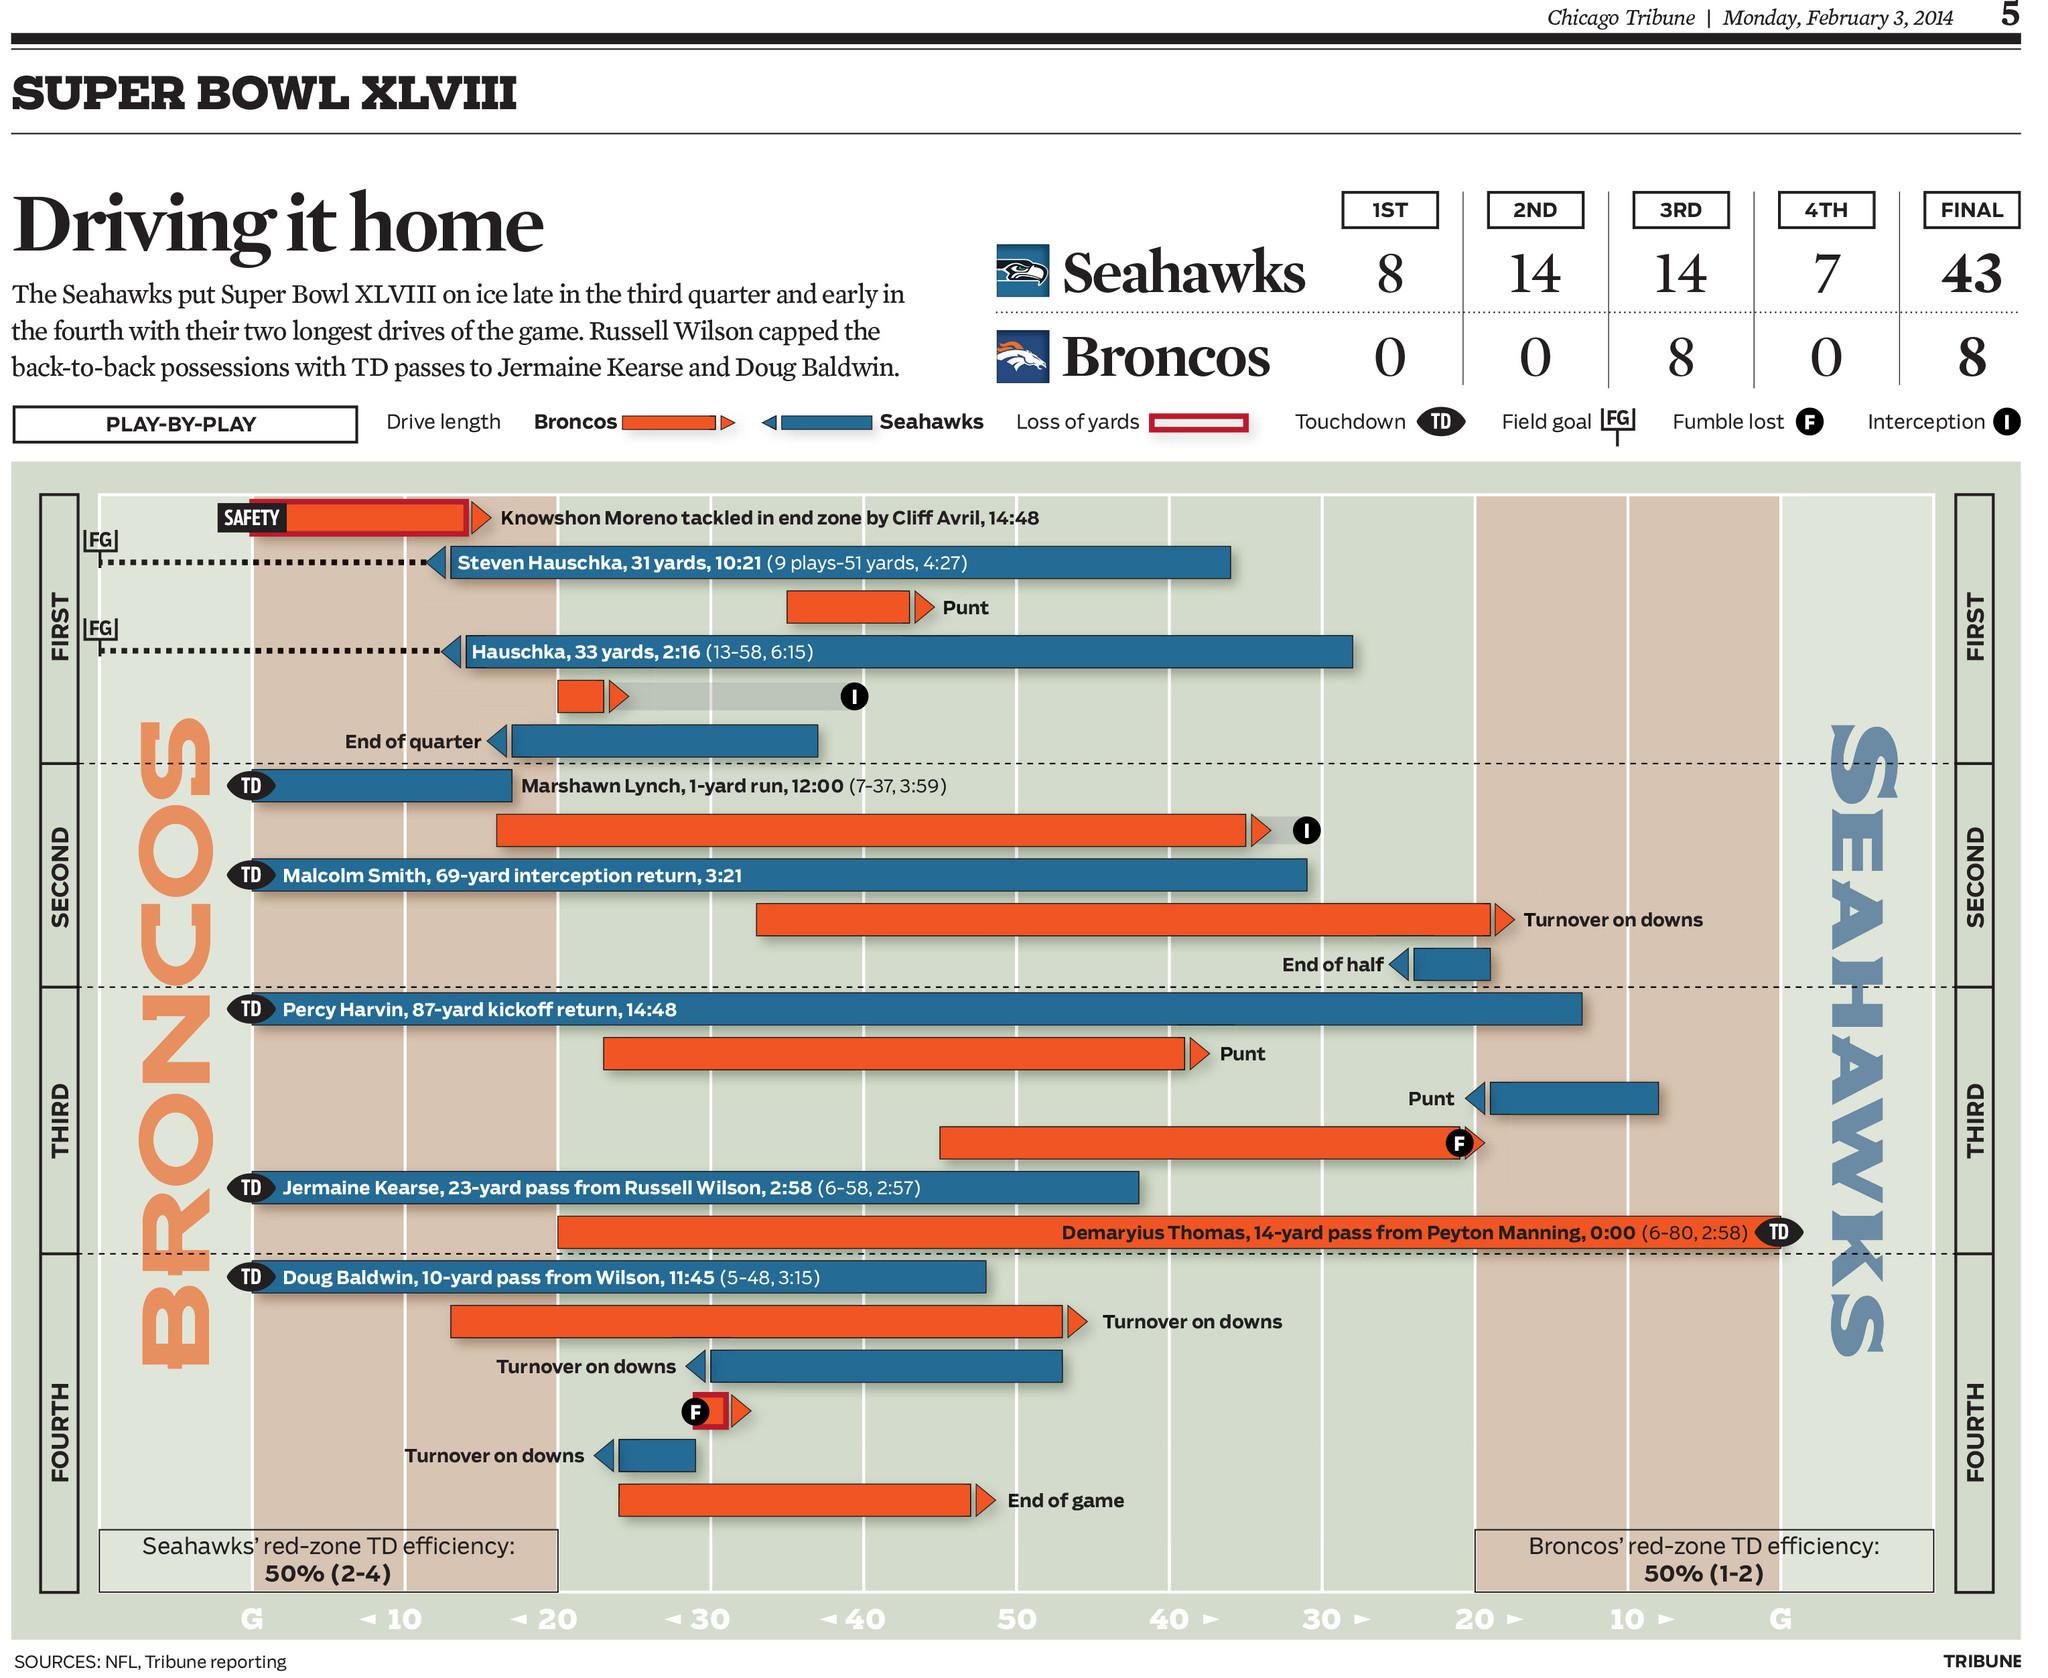 Graphic super bowl drive chart chicago tribune